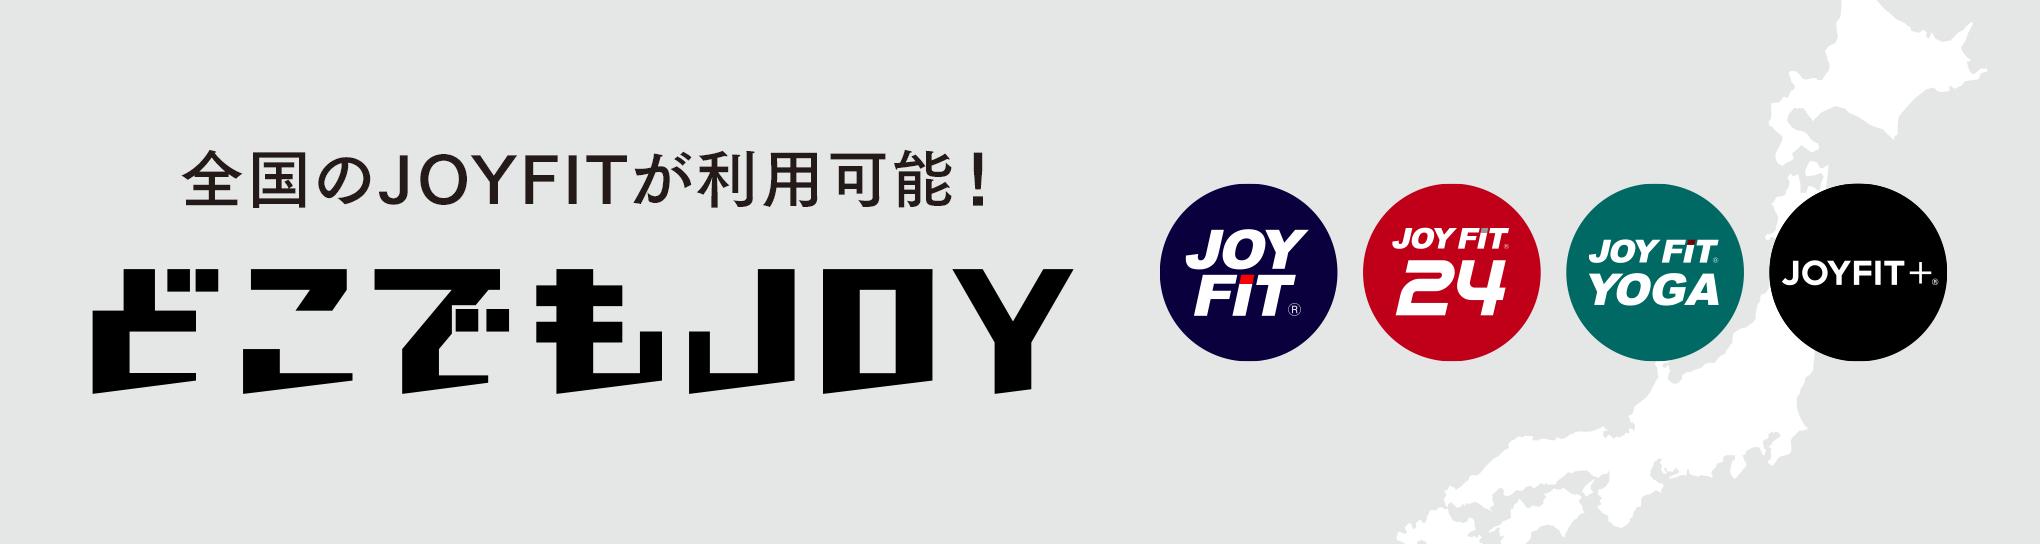 JOYFIT24(ジョイフィット24)錦糸町店のPR